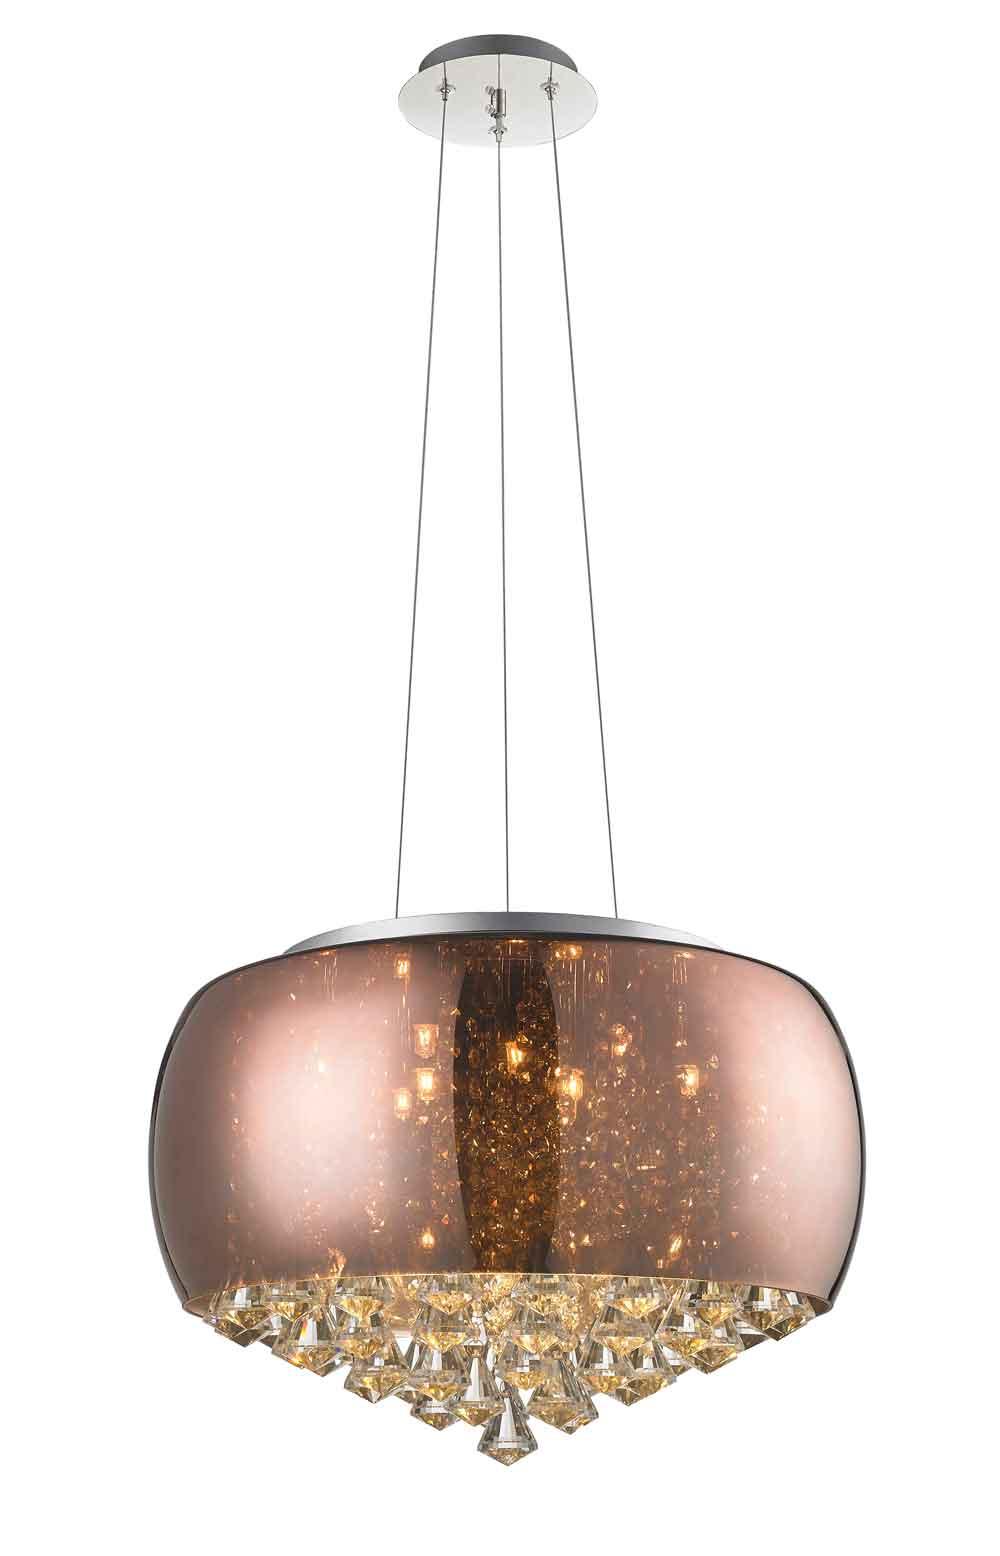 Kit 1x Lustre Plafon Vidro Cristal Bronze 50cm 9G9 + 9x G9 127v 4,5w 3000K